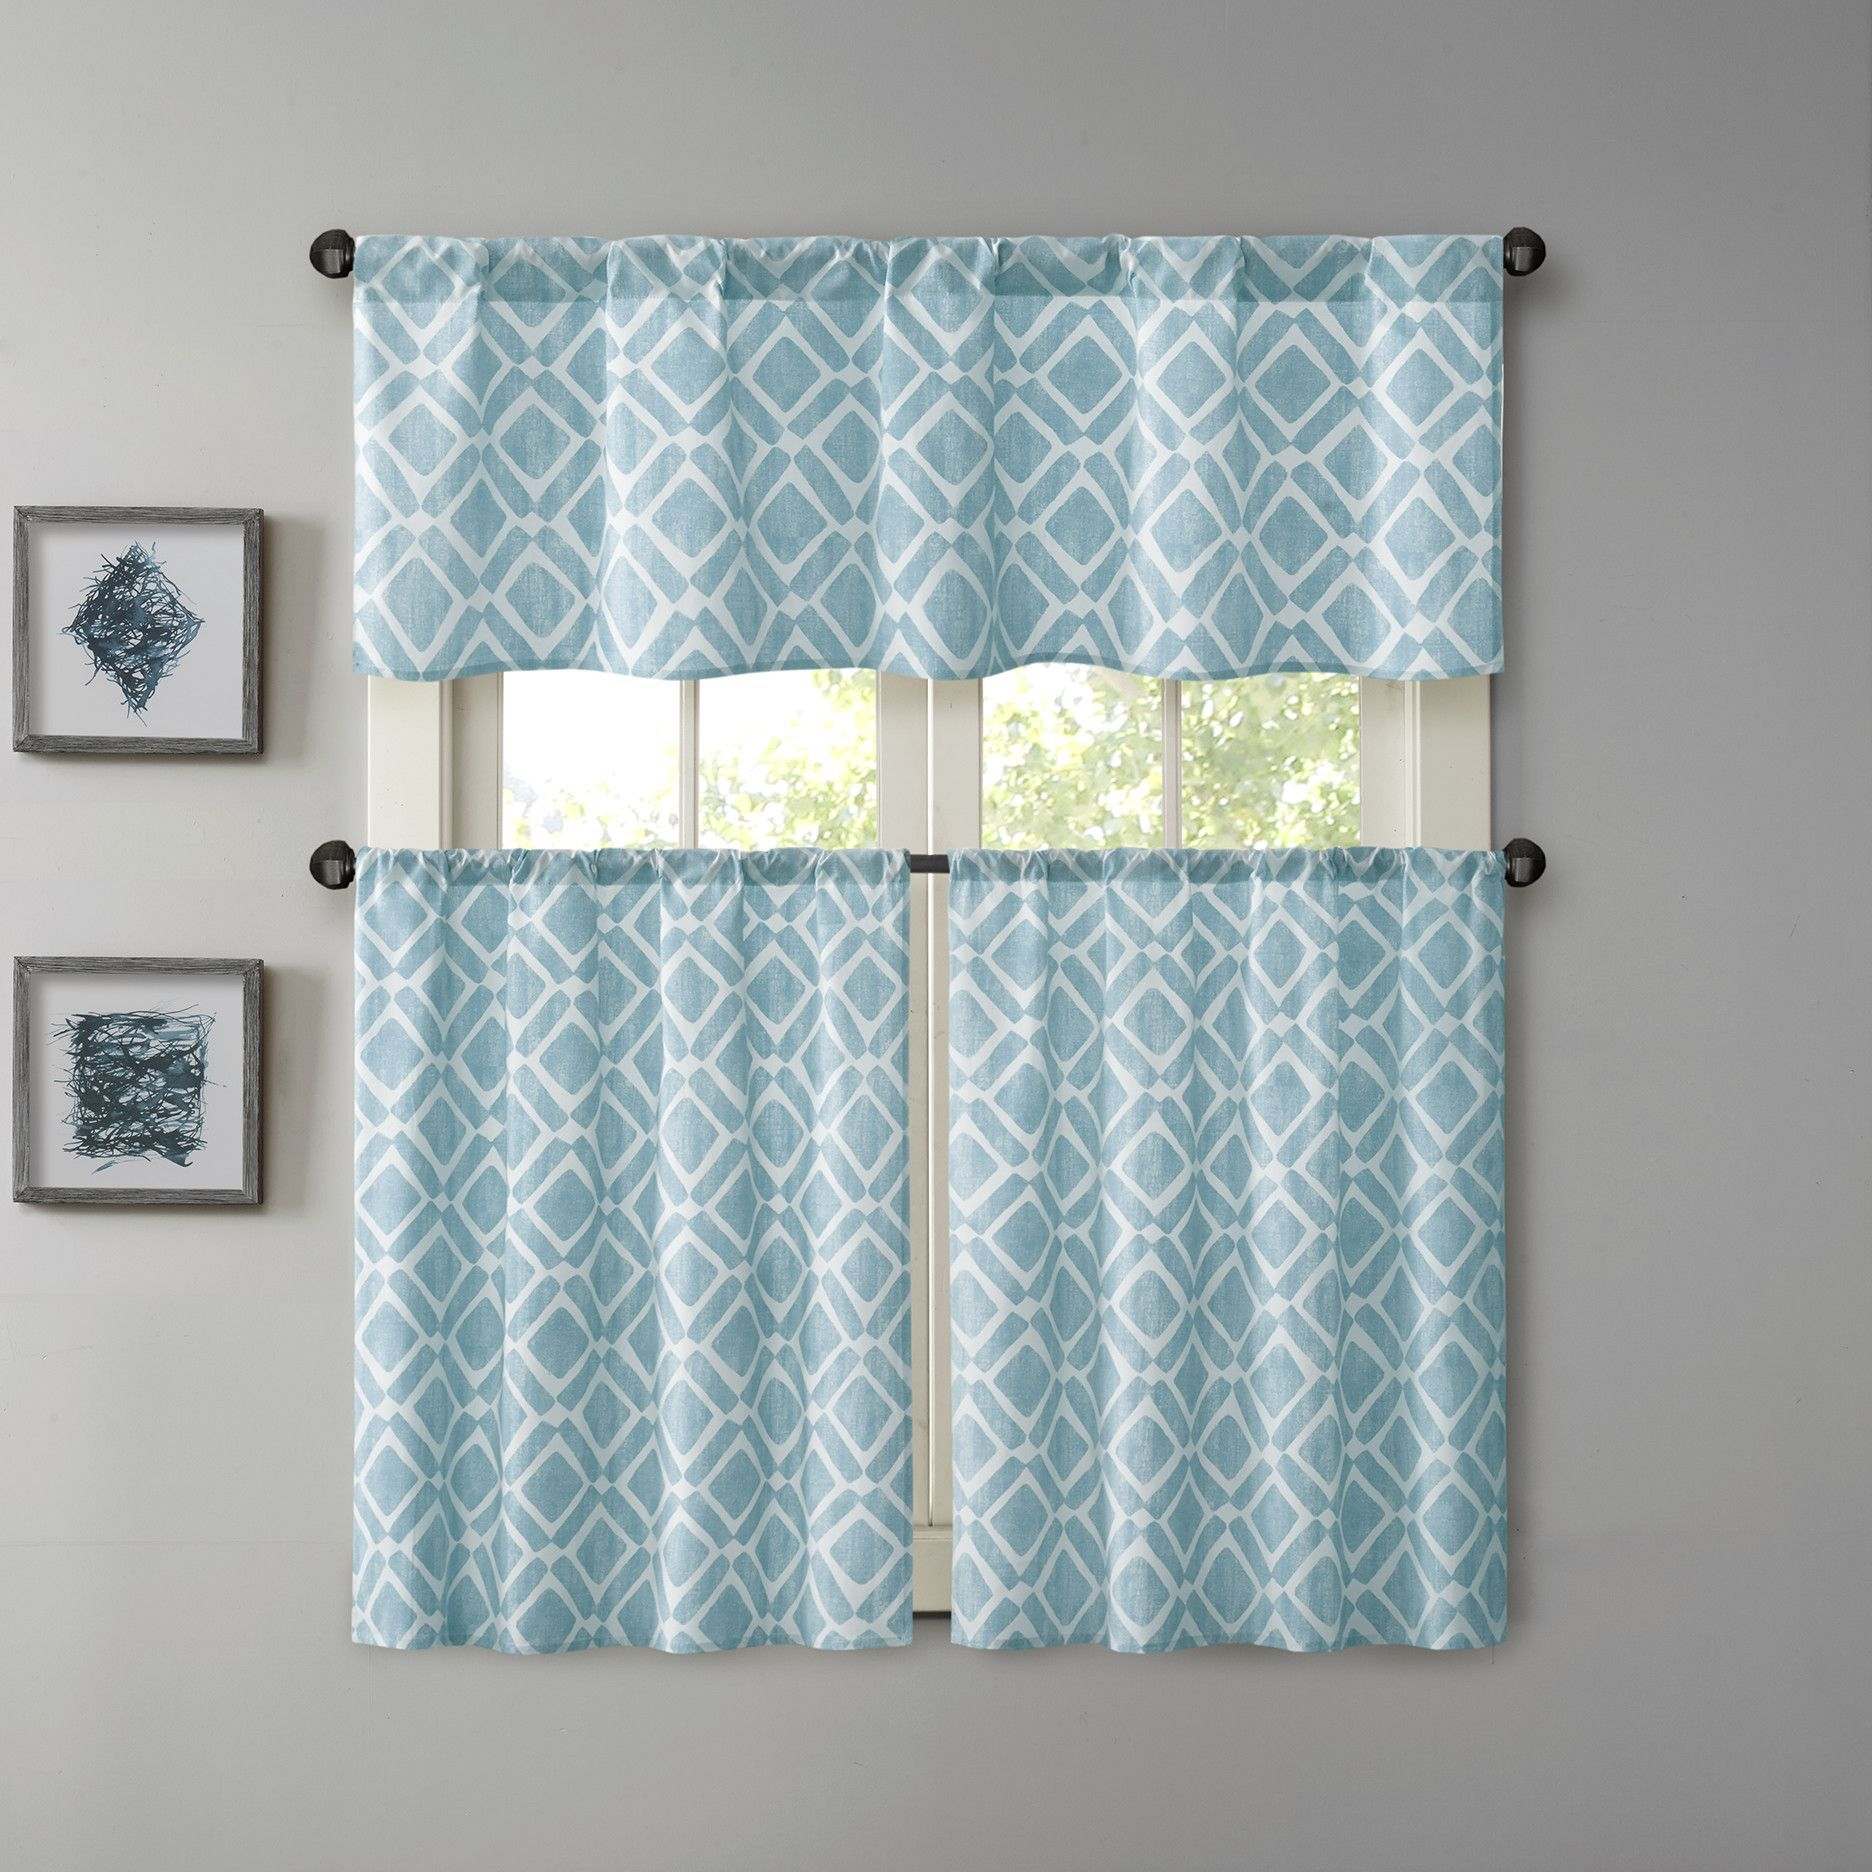 Print Curtain Valance | Products | Pinterest | Valance, Tier ...